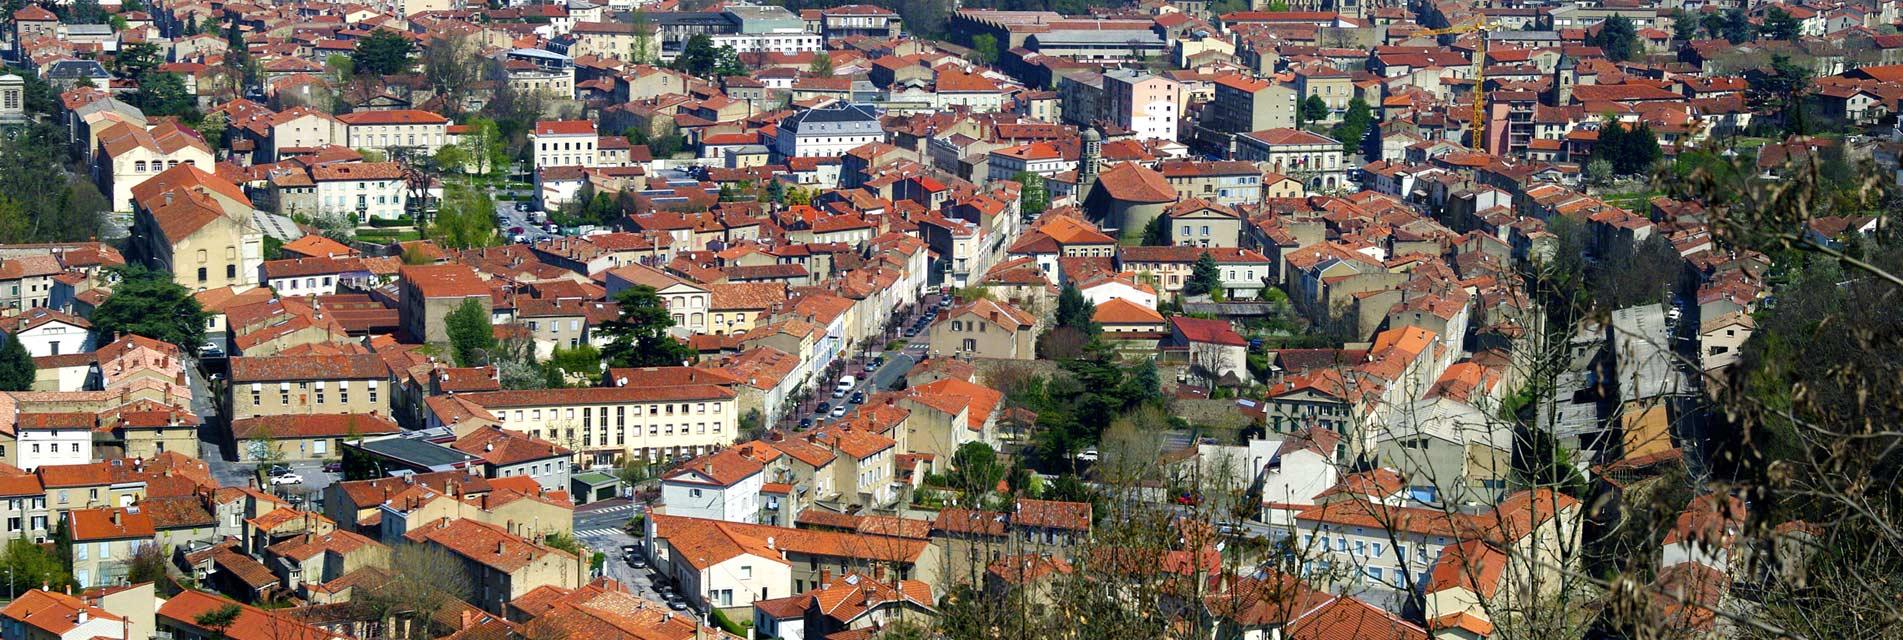 Ville de Mazamet dans le Tarn